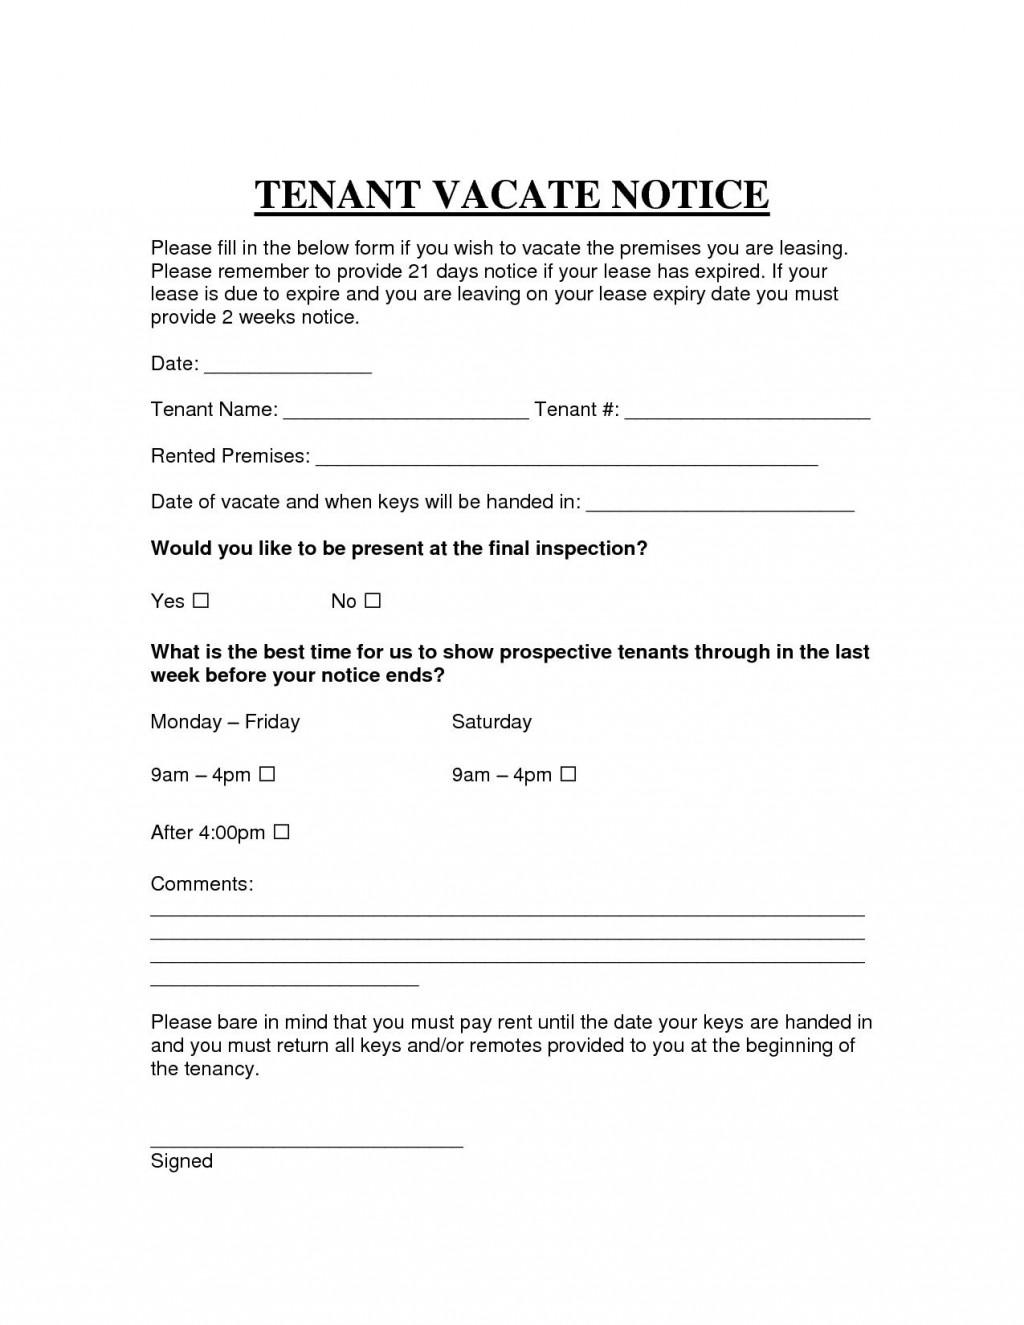 009 Impressive Eviction Notice Template Free Sample  30 Day Uk Word DocumentLarge